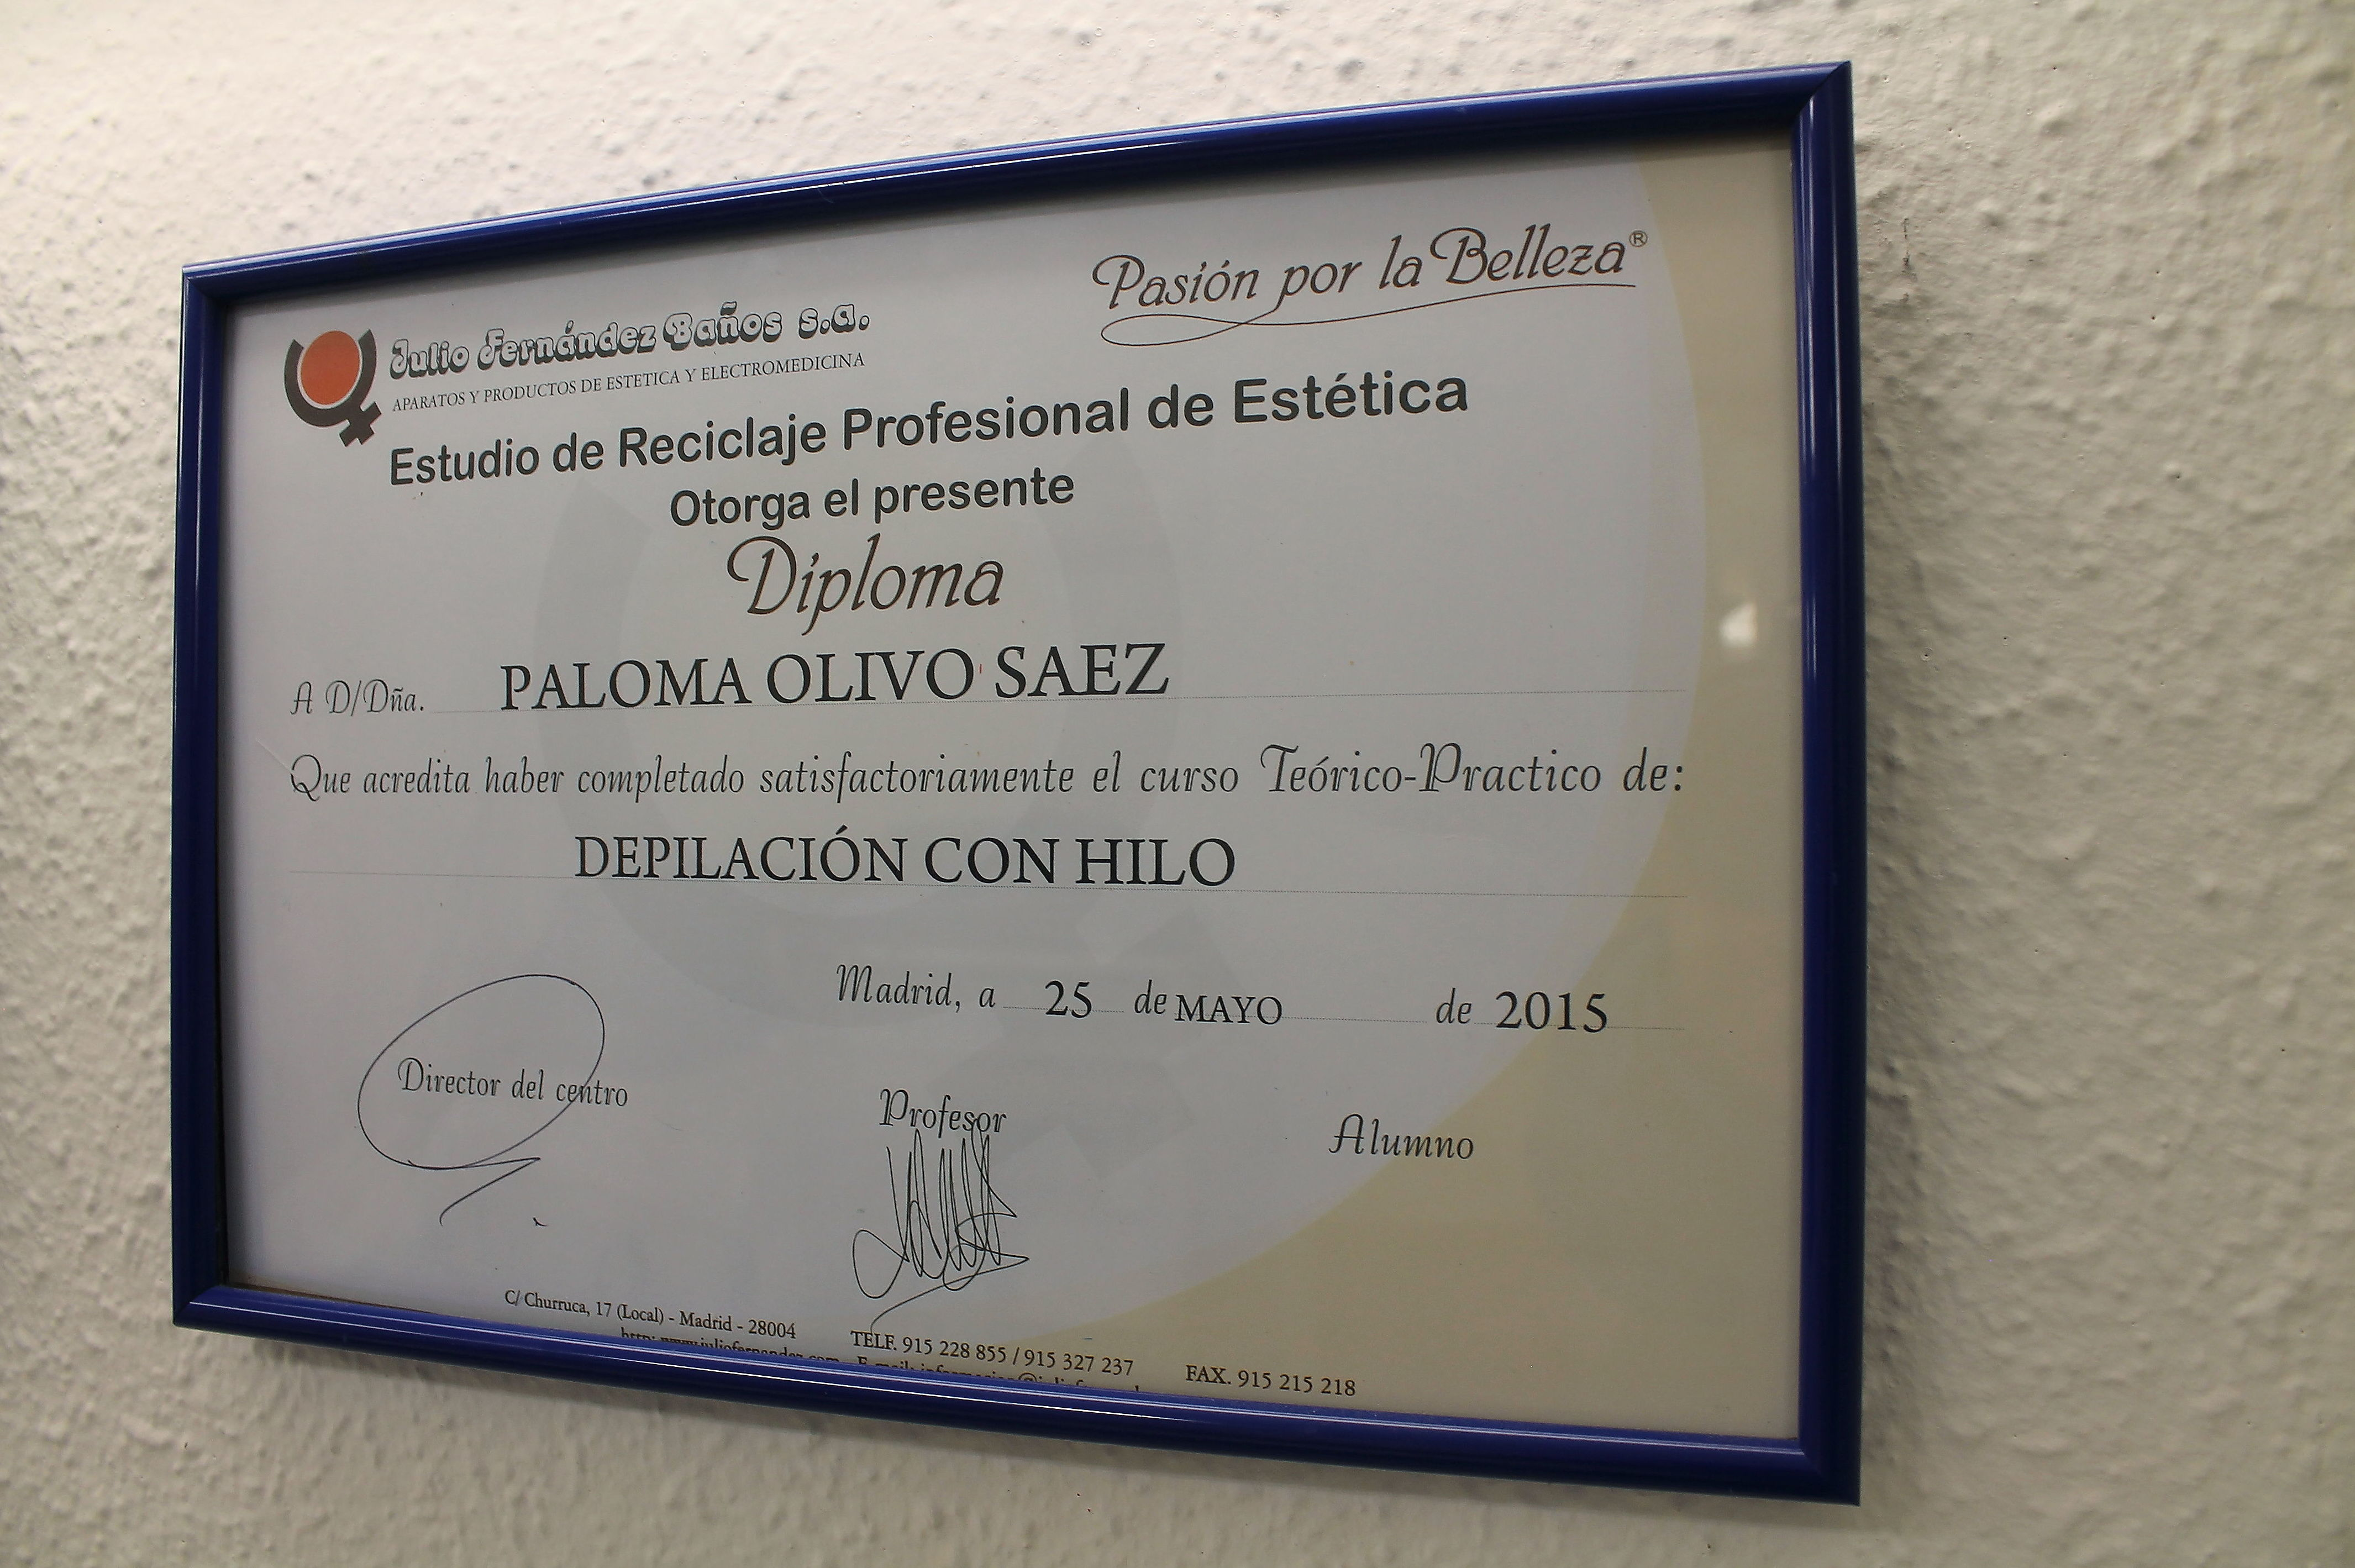 Diploma de depilación con hilo